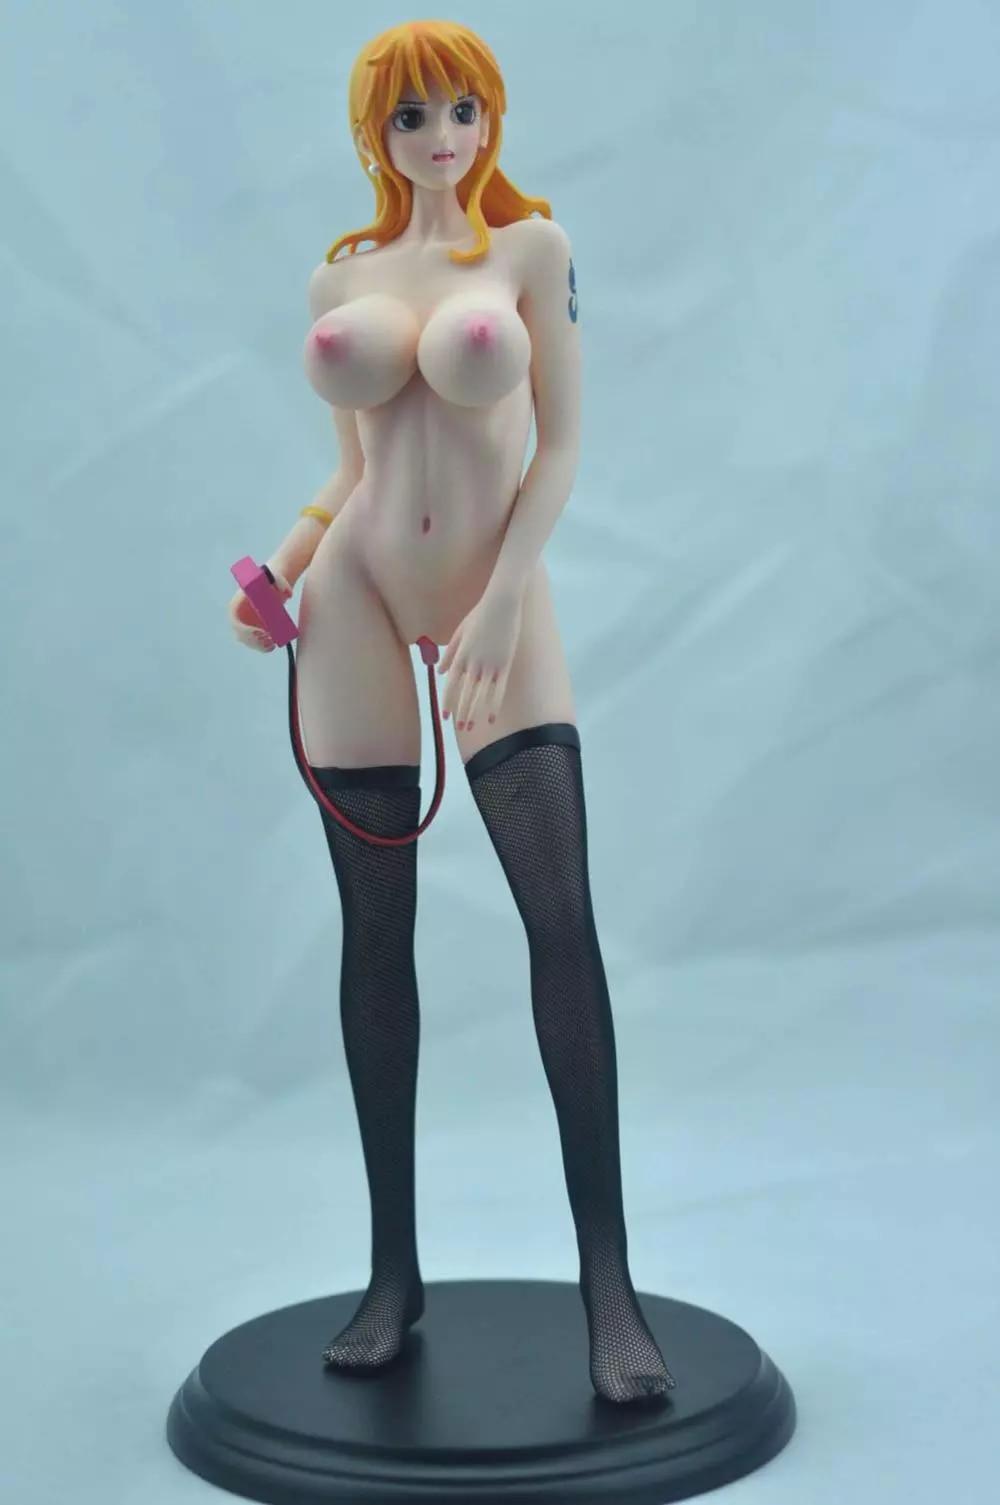 One Piece Nami Nude : piece, Piece, Resin, Figure, Vibrator, Stockings, Adult, Figures, Japanese, Anime, Model, Quality|resin, Material|figure, Sexyresin, AliExpress